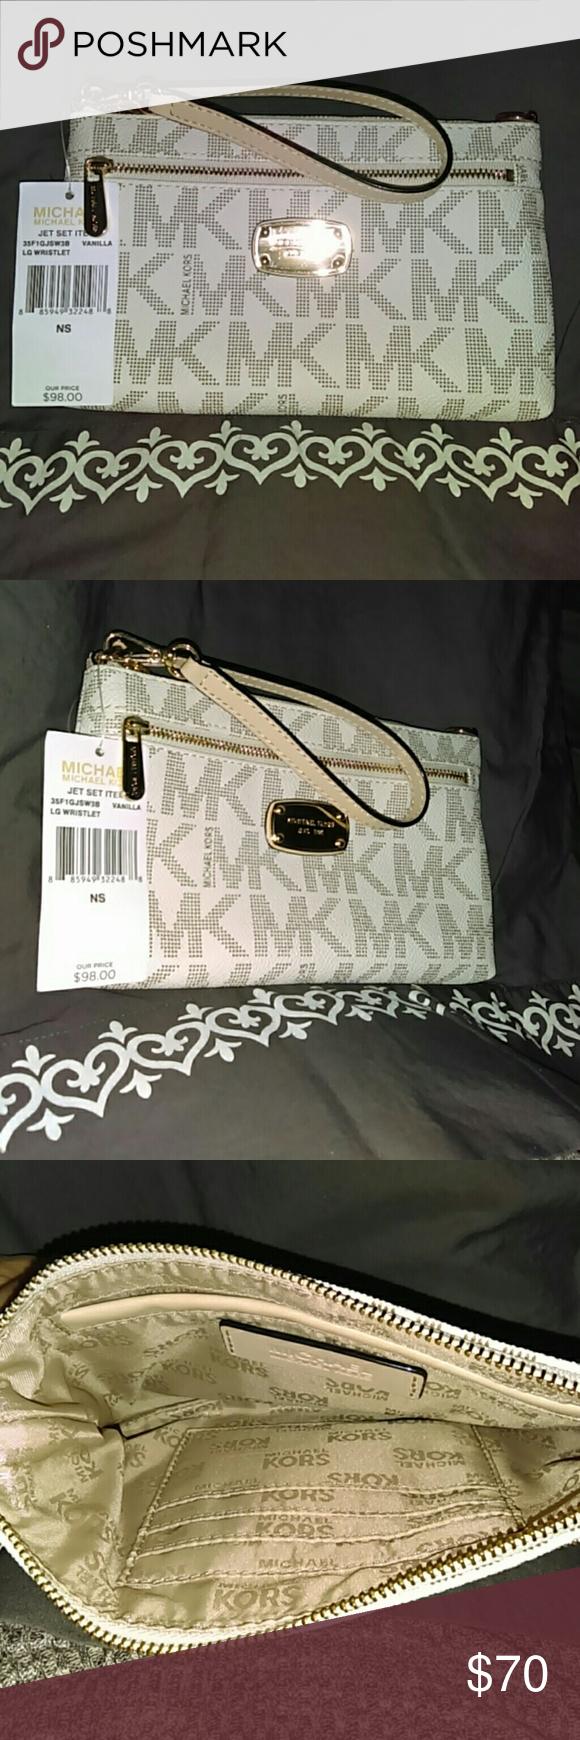 ce7d37798aada Michael Kors jet set vanilla large wristlet 100% authentic brand new tags  still on it